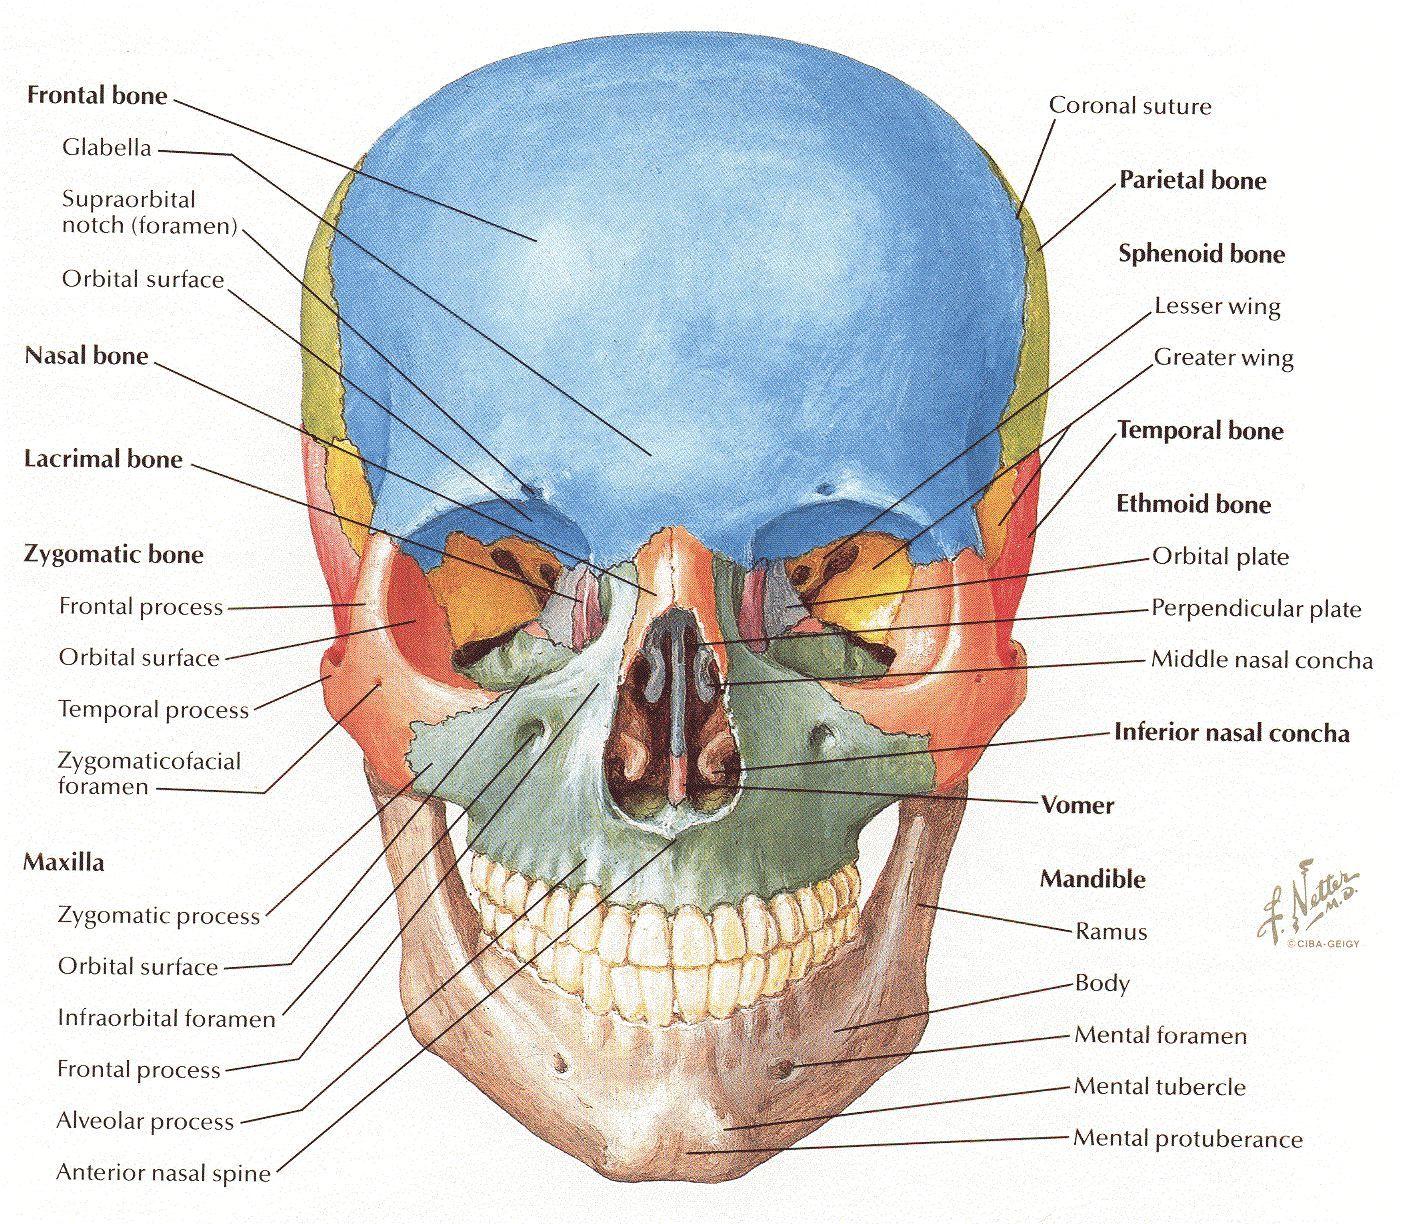 Netter cranium frontal view. | Hmn Antmy | Pinterest